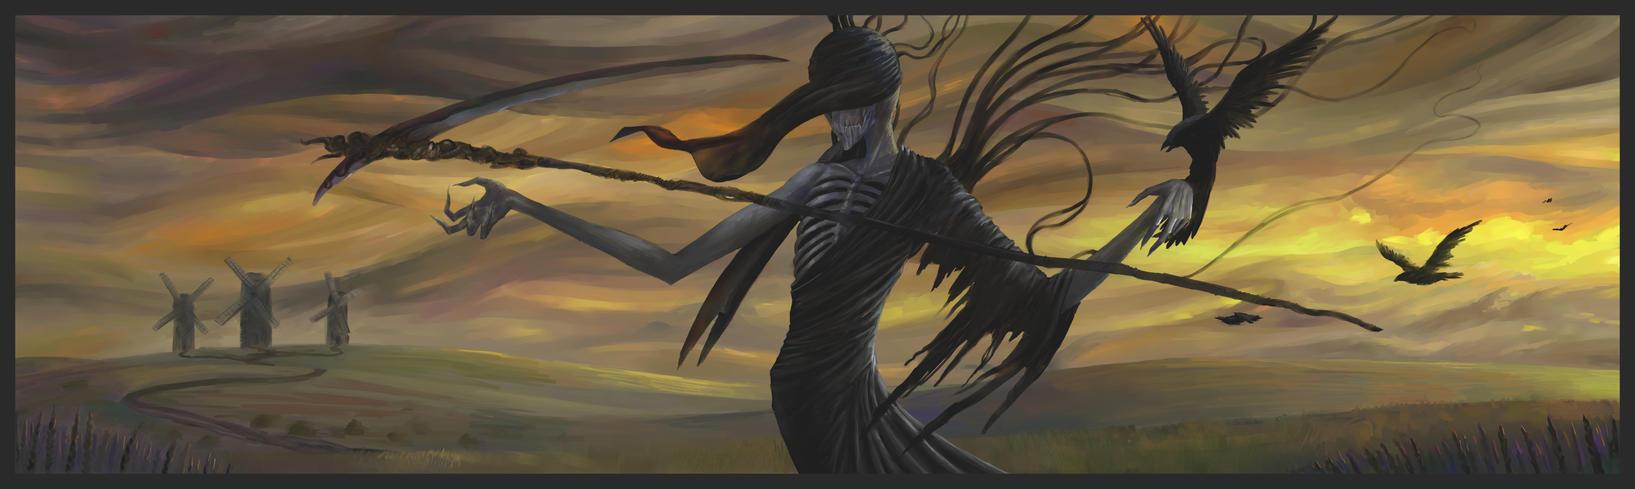 Angel of death by Theocrata